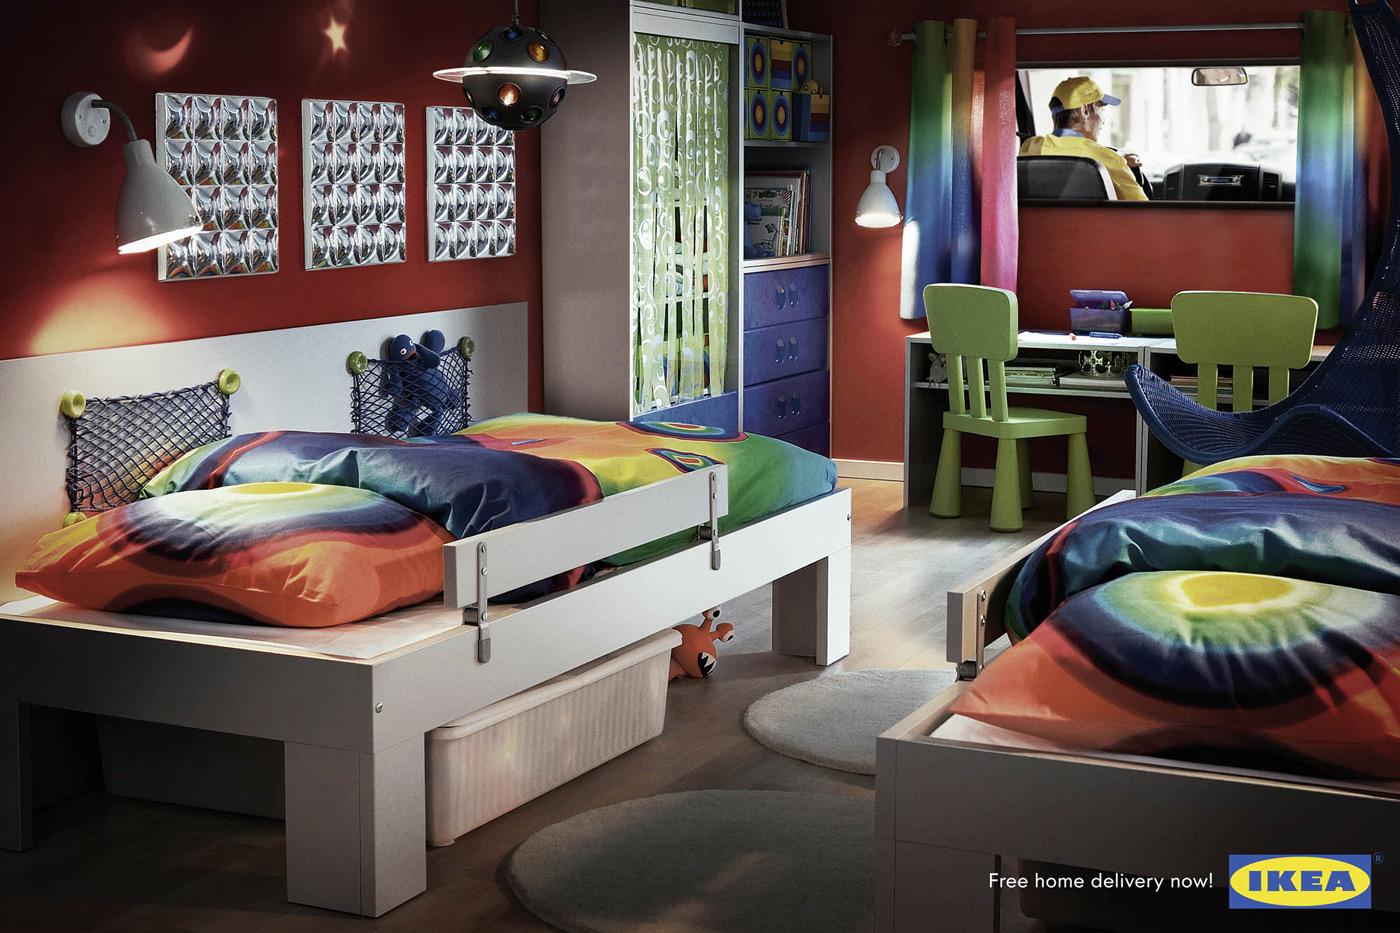 غرف نوم شباب ايكيا | المرسال